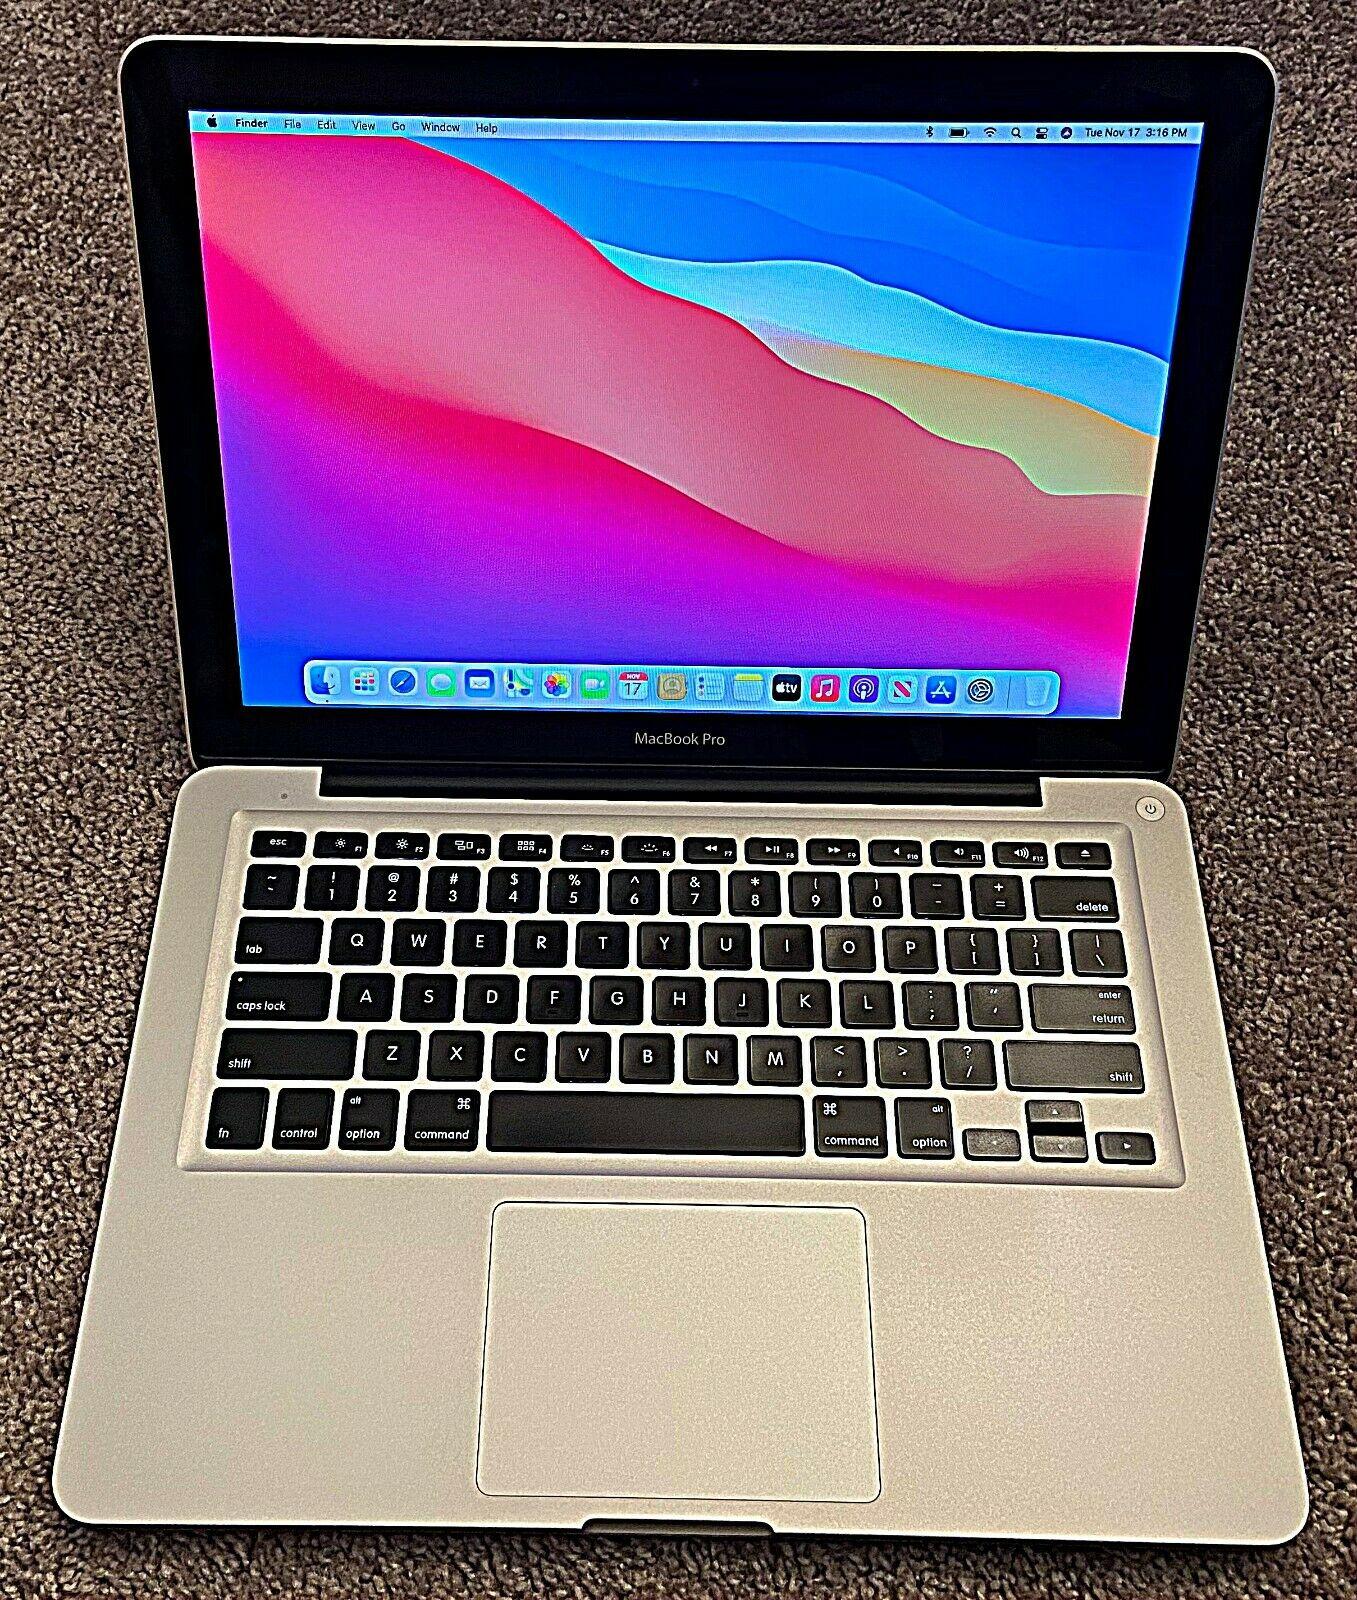 Apple MacBook Pro 13 | MacOS Big Sur 2020 | 16GB RAM | 1TB SSD | WARRANTY | . Buy it now for 740.79